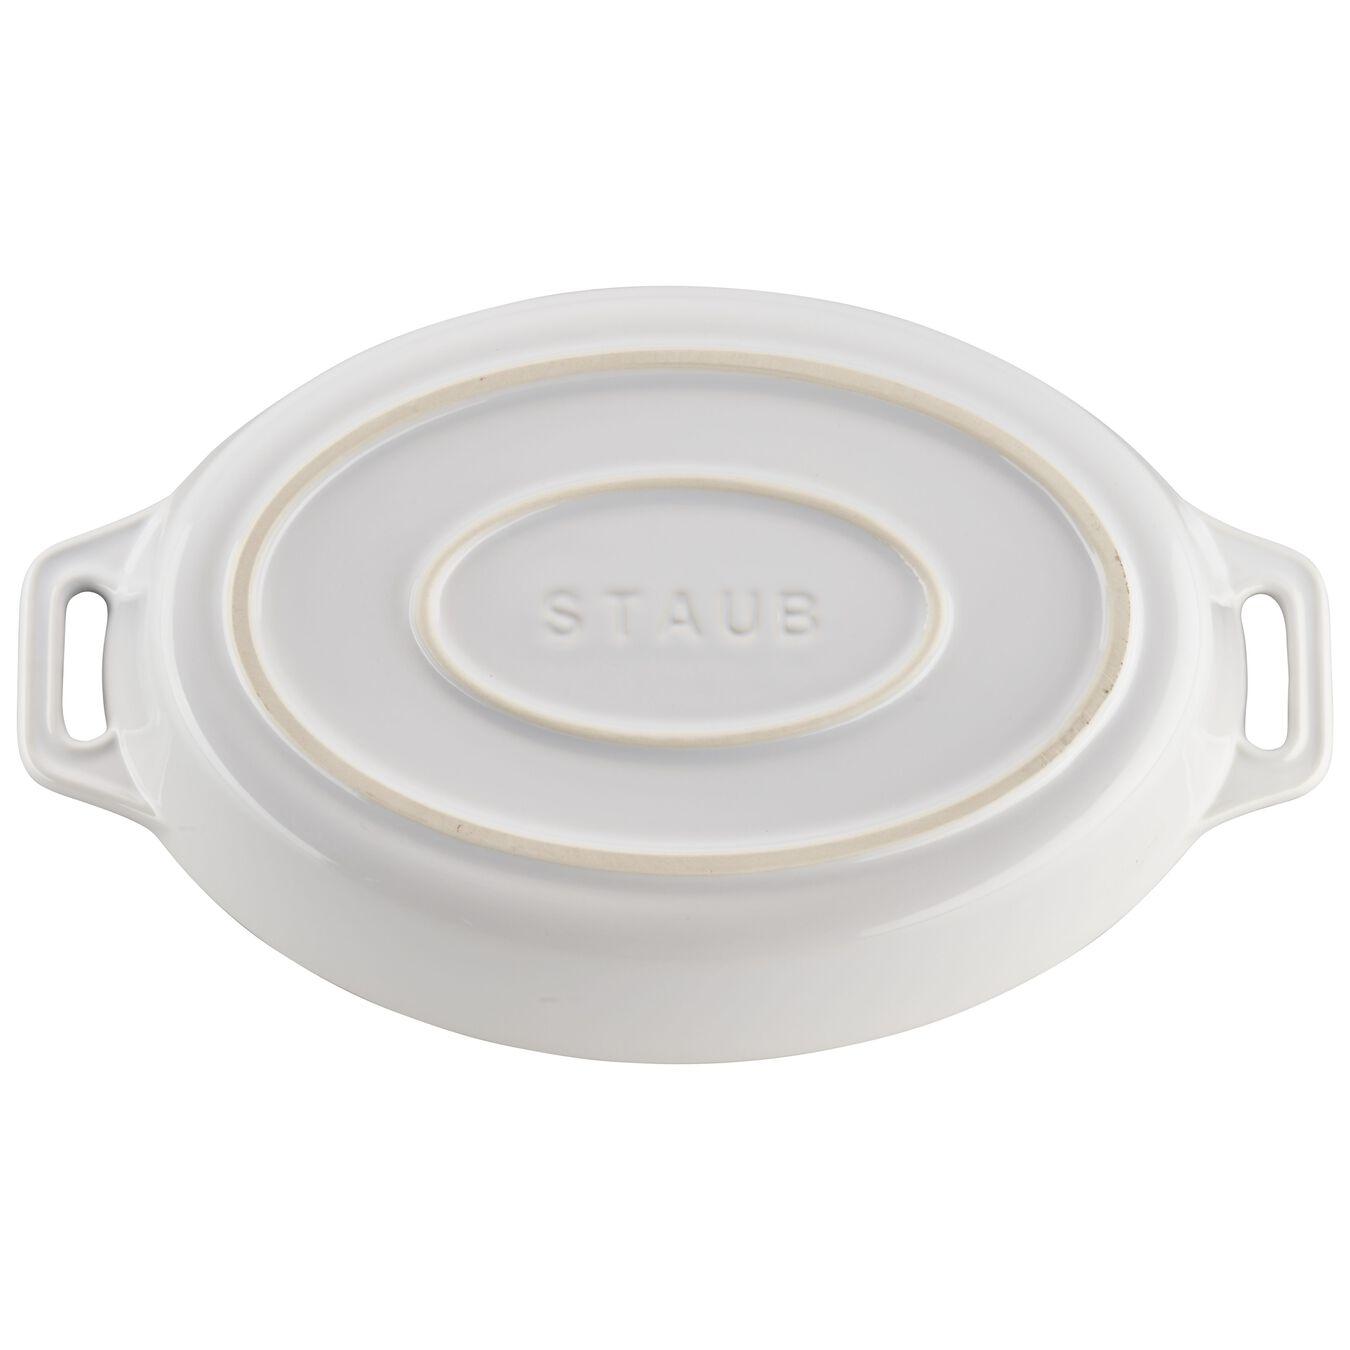 2-pc, oval, Bakeware set, white,,large 6